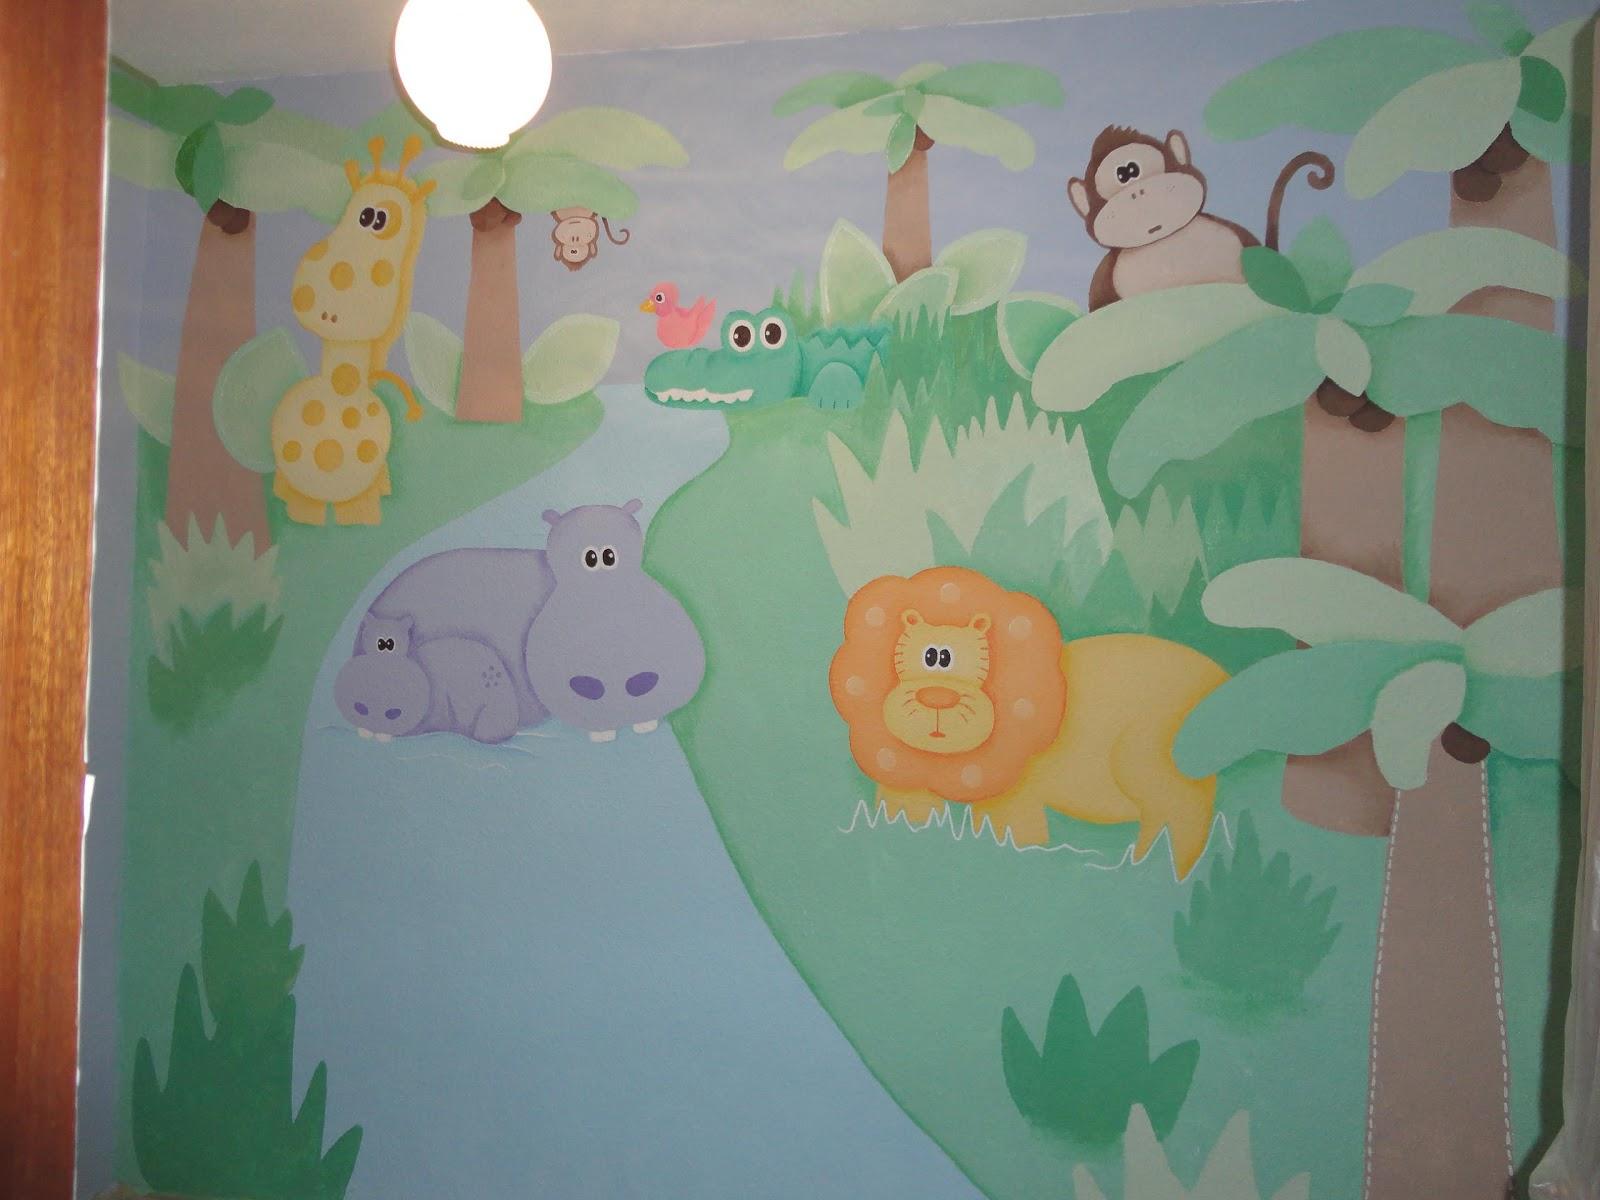 Decopared murales infantiles pintados en paredes - Paredes habitaciones infantiles ...